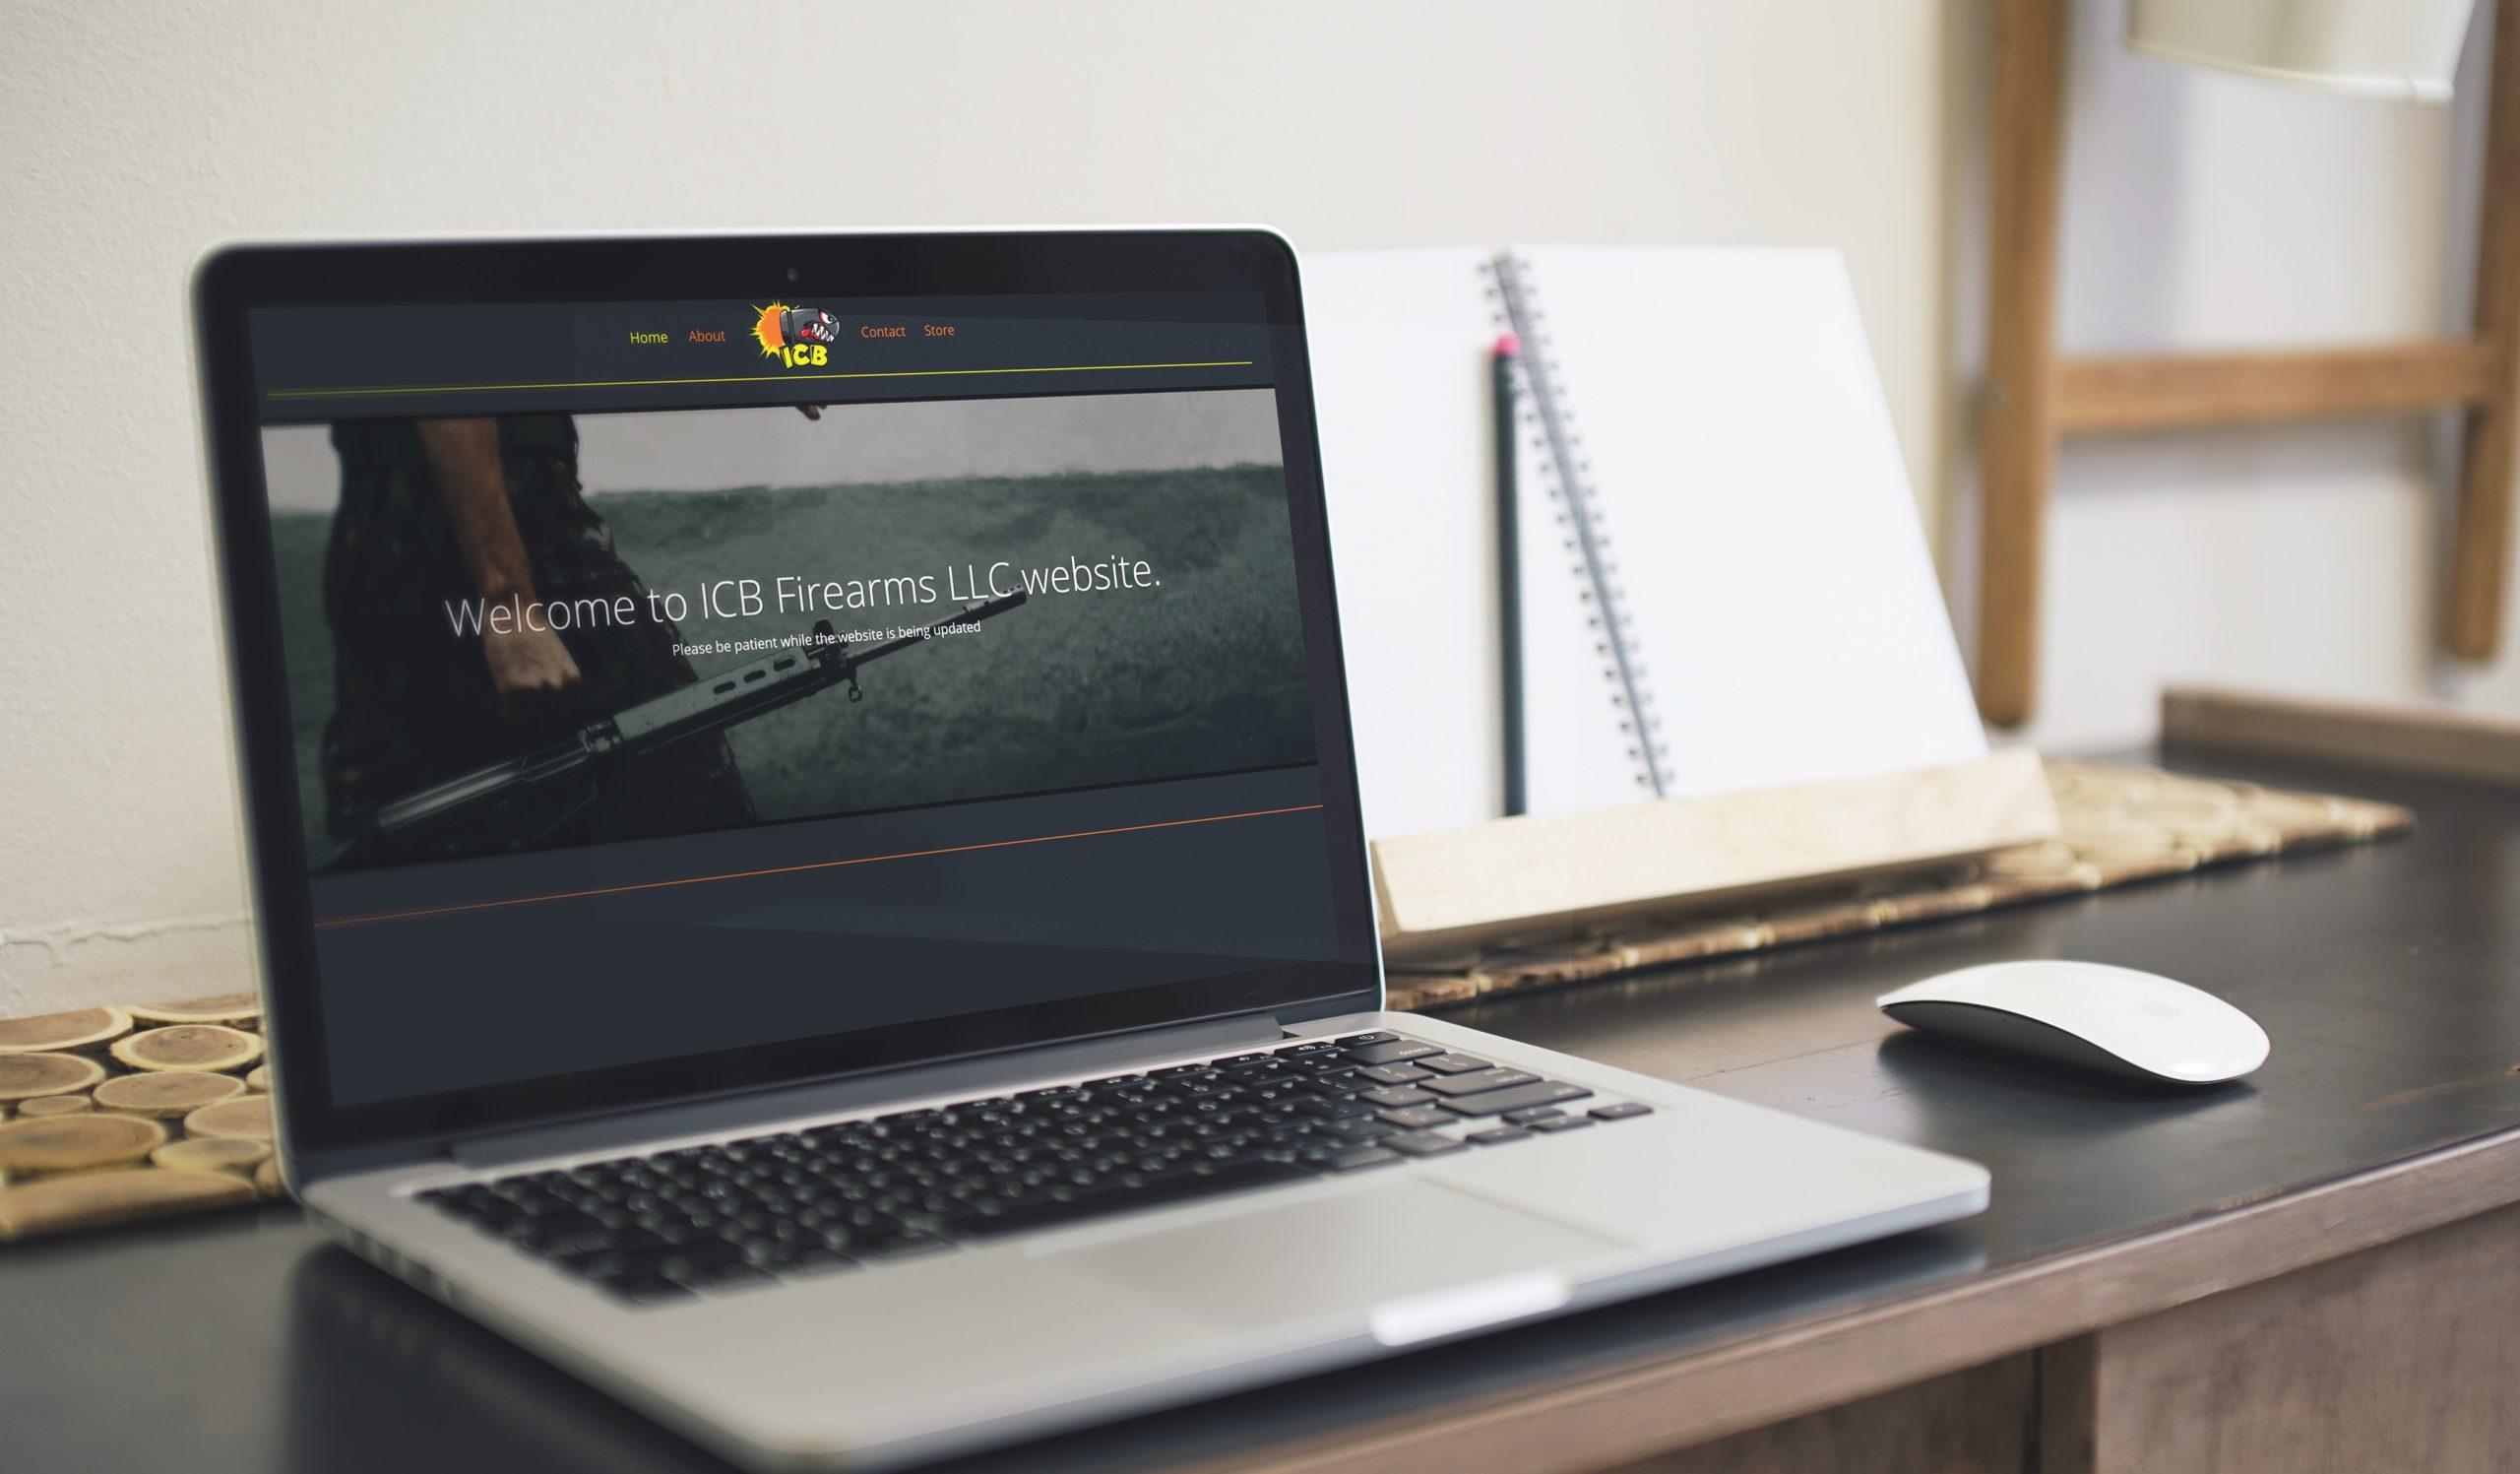 ICB Firearms - Website Mockup 01